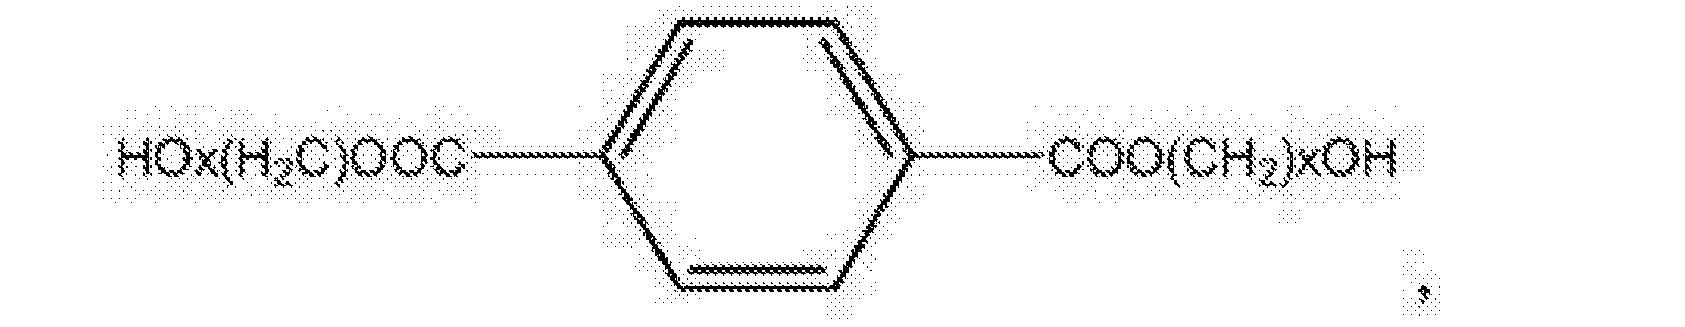 Figure CN106893640AD00051